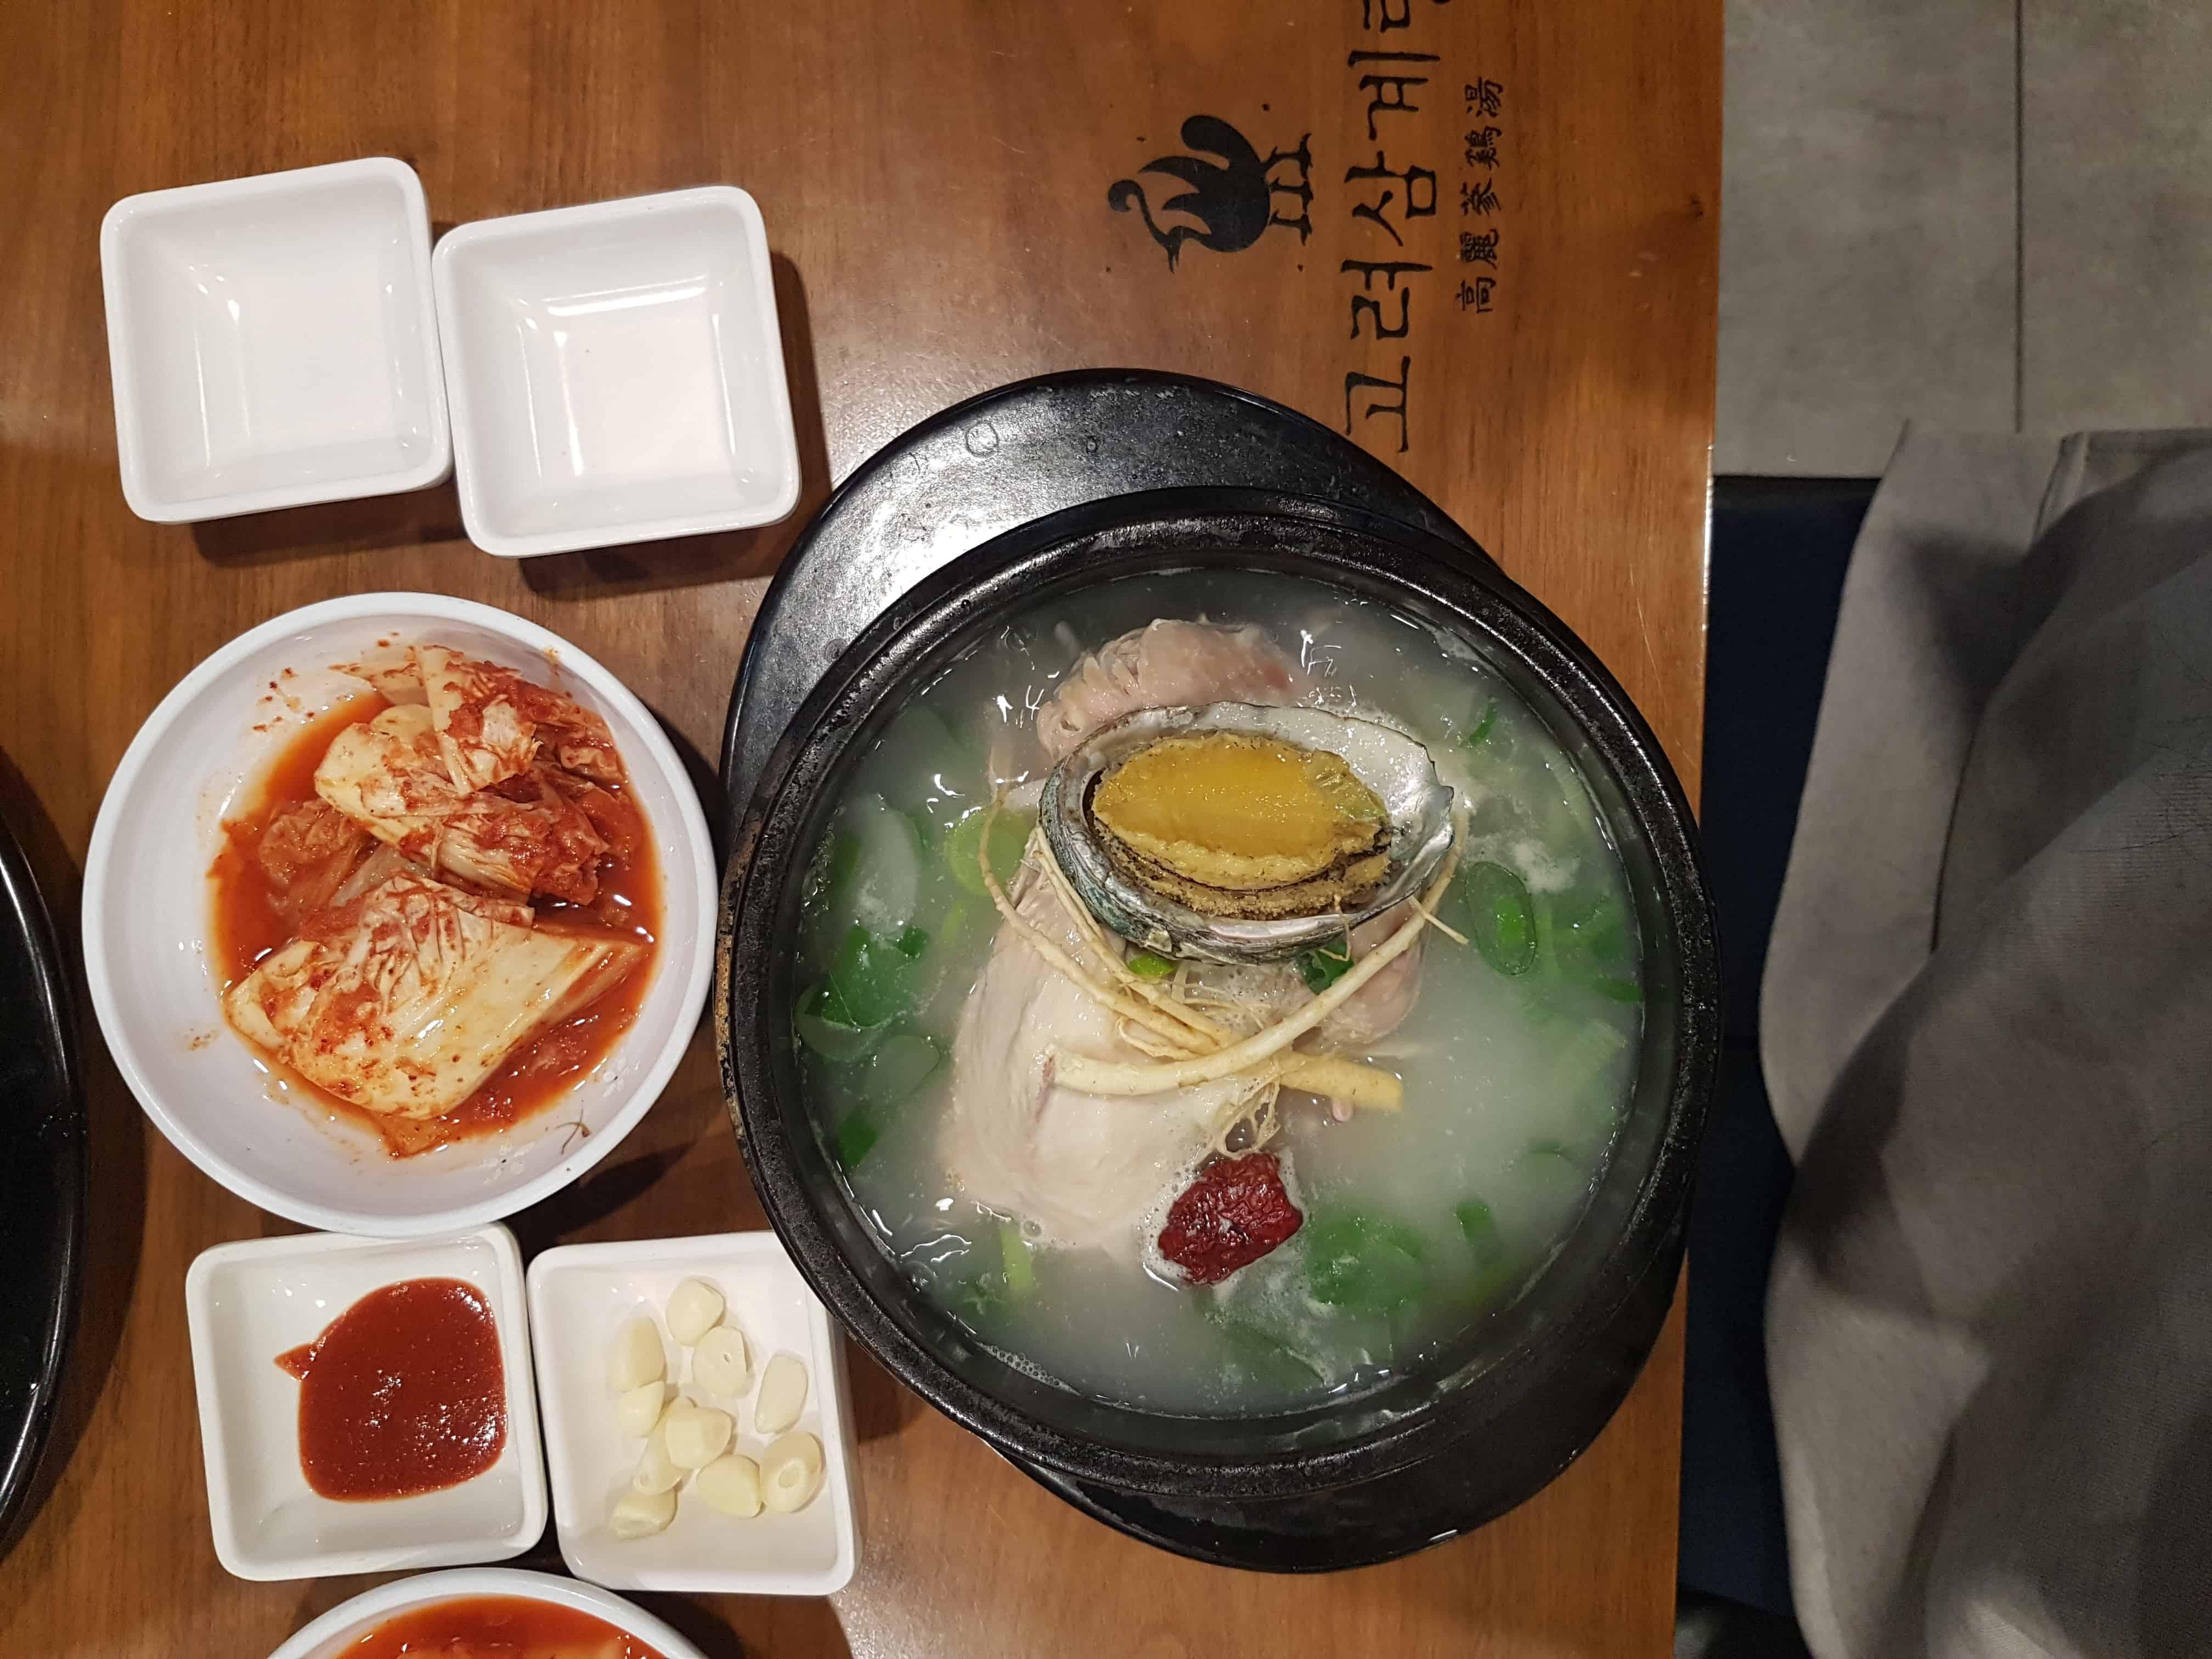 1 Seosomun-ro 11-gil, Seosomun-dong, Jung-gu, Seoul